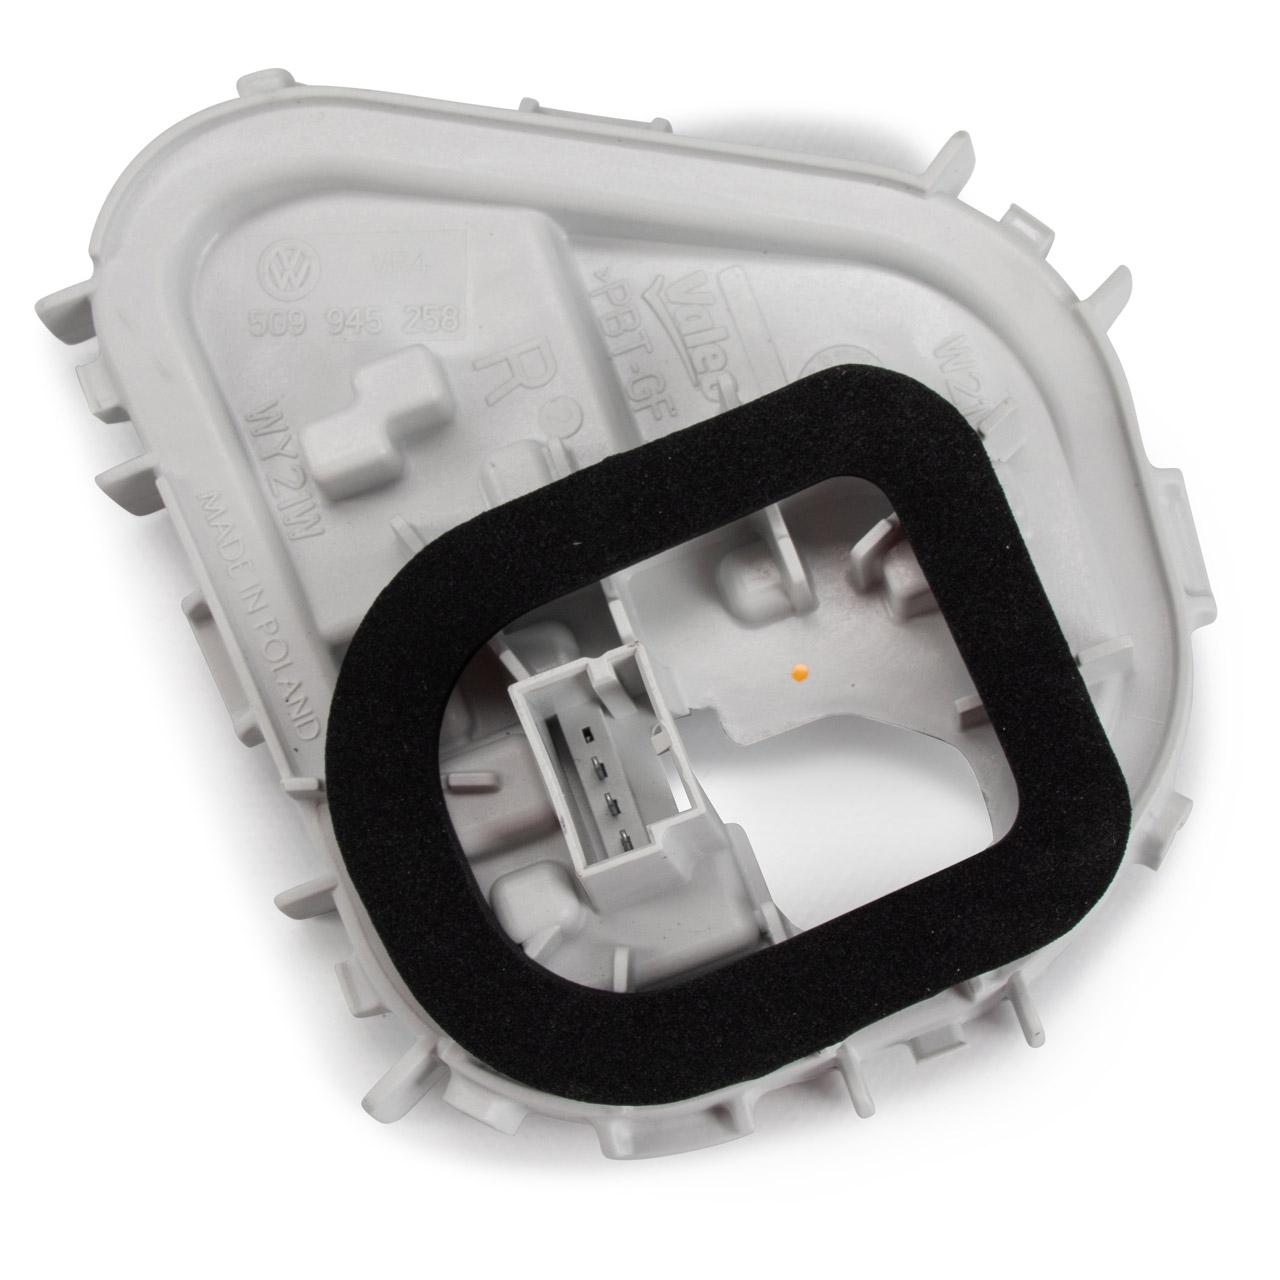 ORIGINAL VW Lampenträger Heckleuchte GOLF 7 Variant (BA5) rechts außen 5G9945258